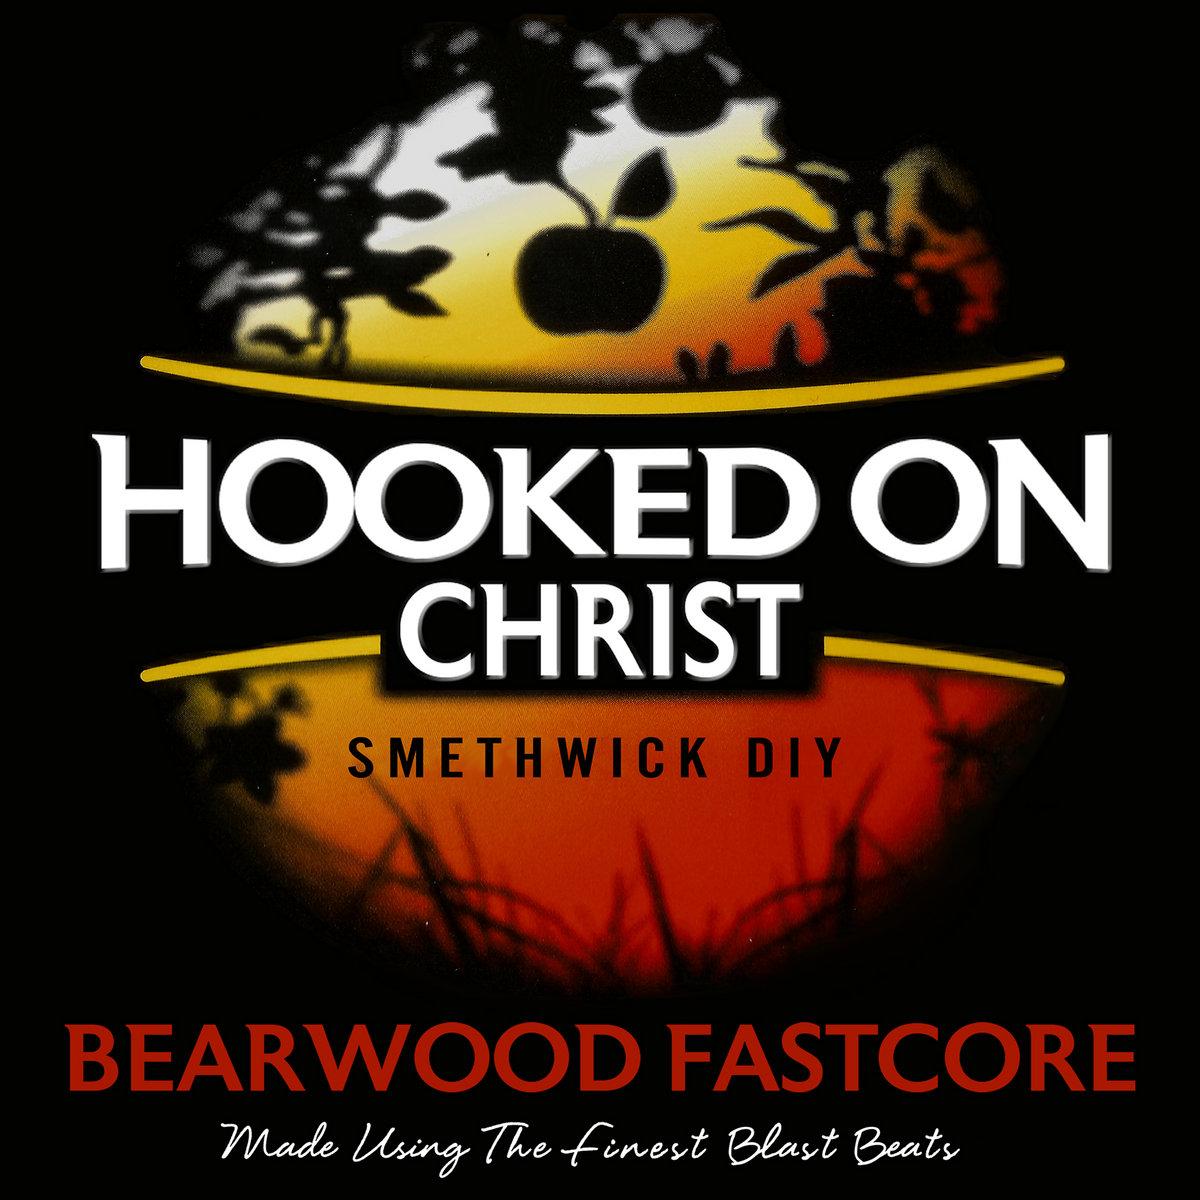 Hooked on christhack job split hooked on christ by hooked on christhack job ccuart Images